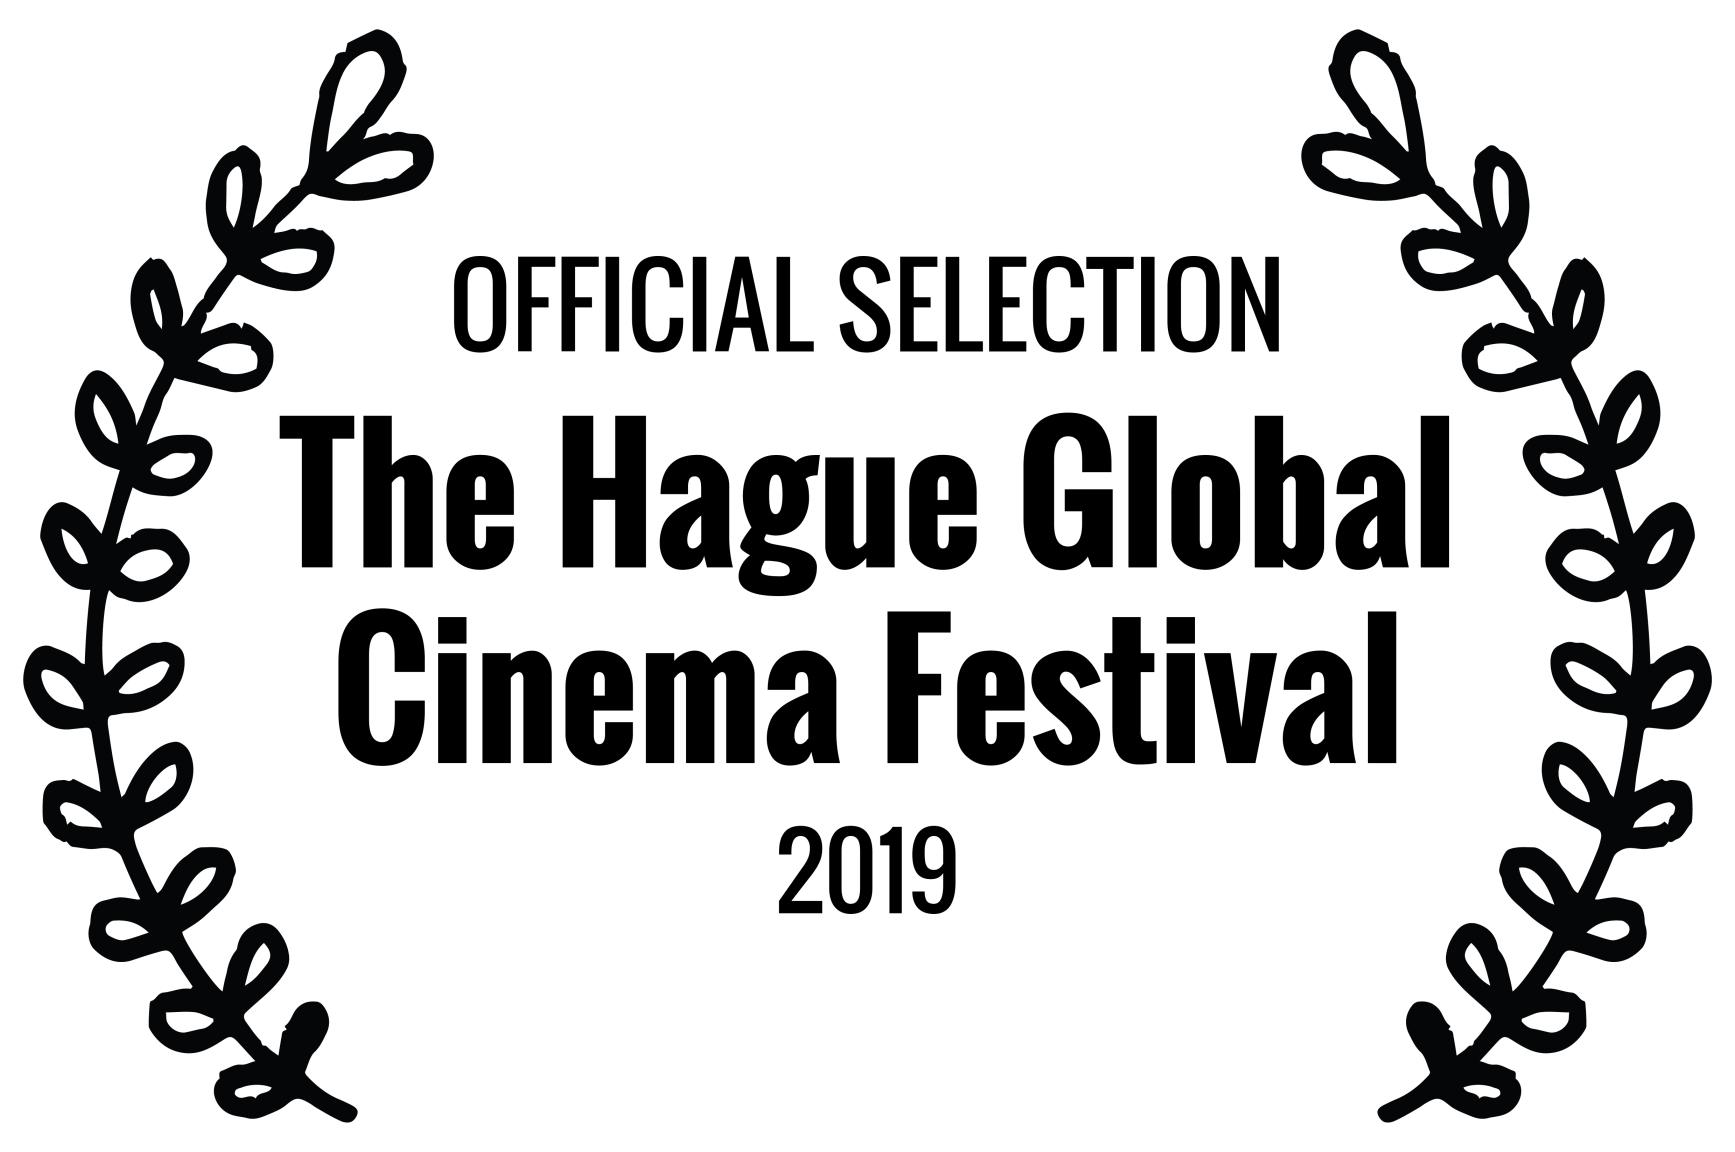 OFFICIAL SELECTION - The Hague Global Cinema Festival - 2019.jpg